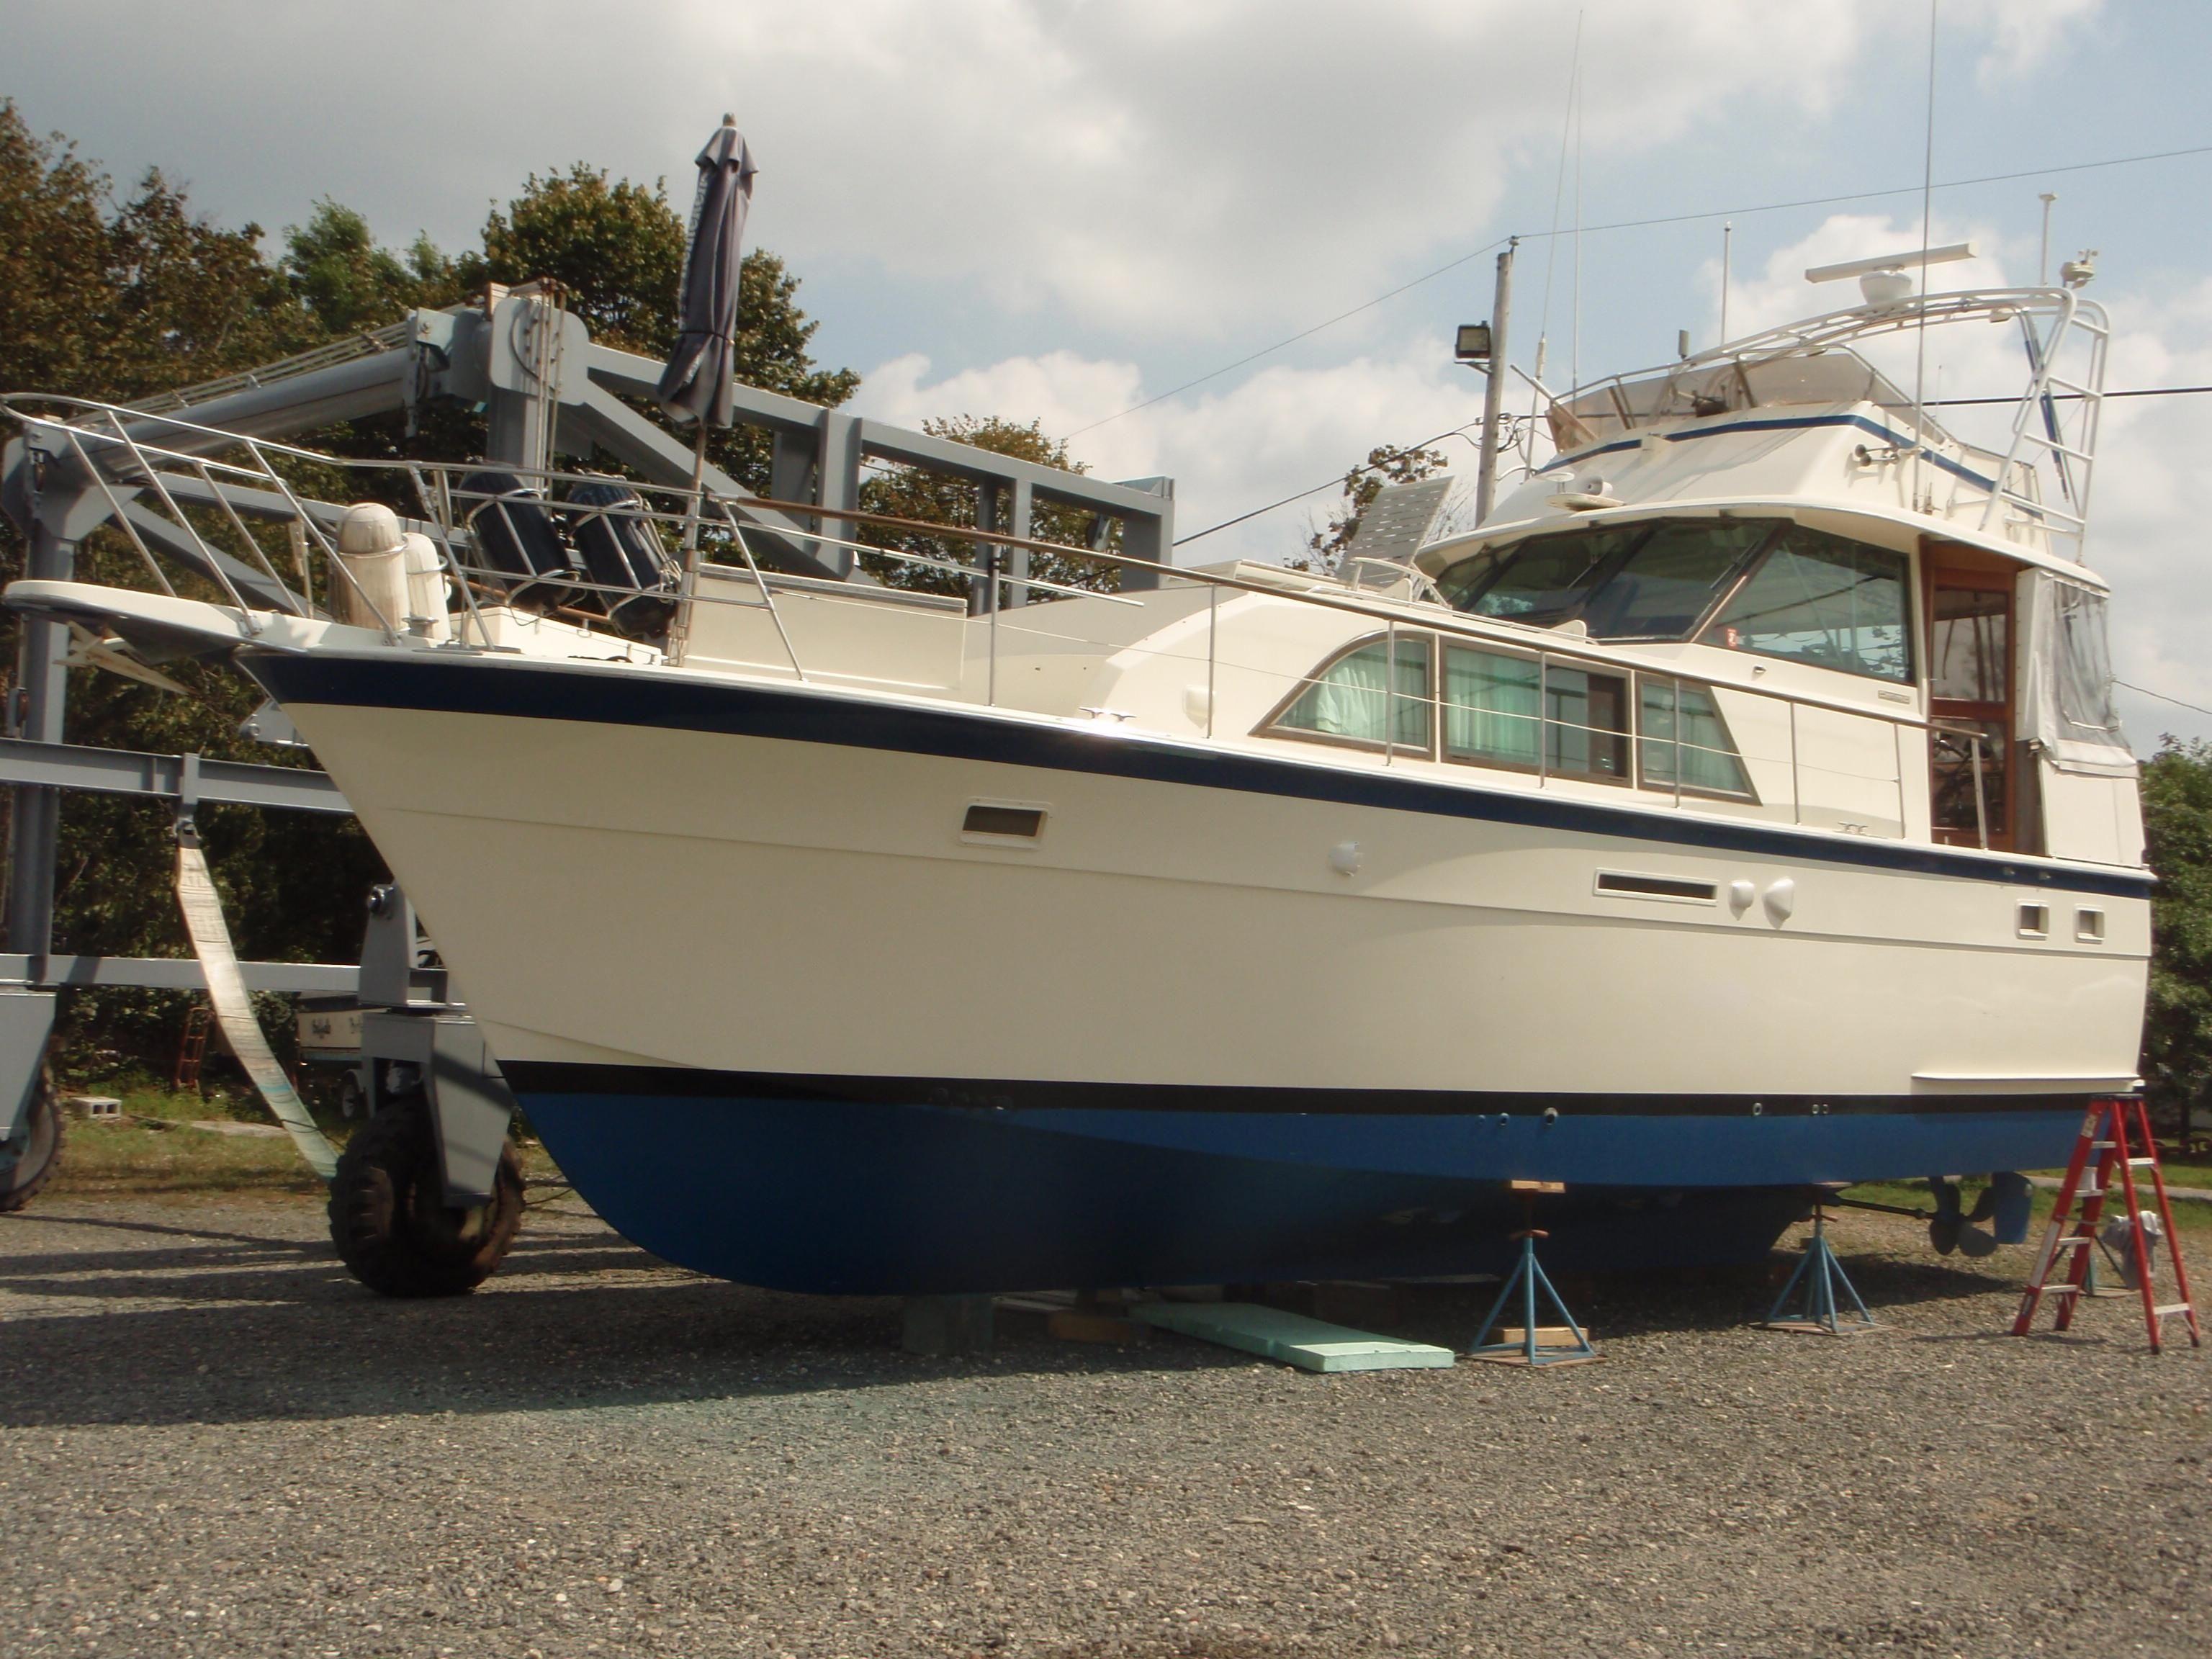 1982 hatteras 43 double cabin power boat for sale www for Viking 43 double cabin motor yacht